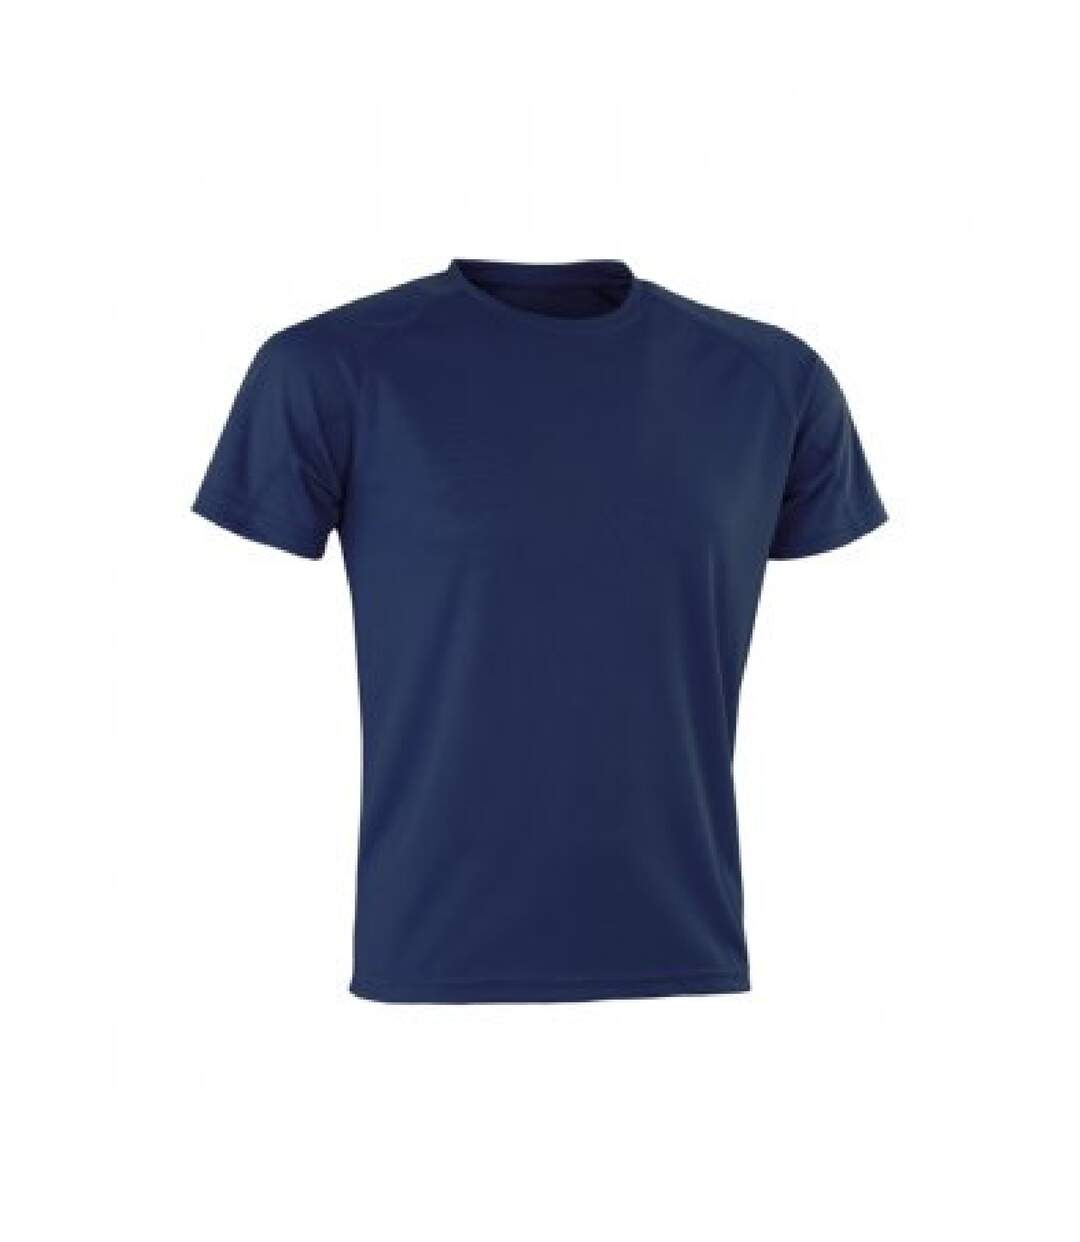 Spiro Mens Aircool T-Shirt (Navy) - UTPC3166